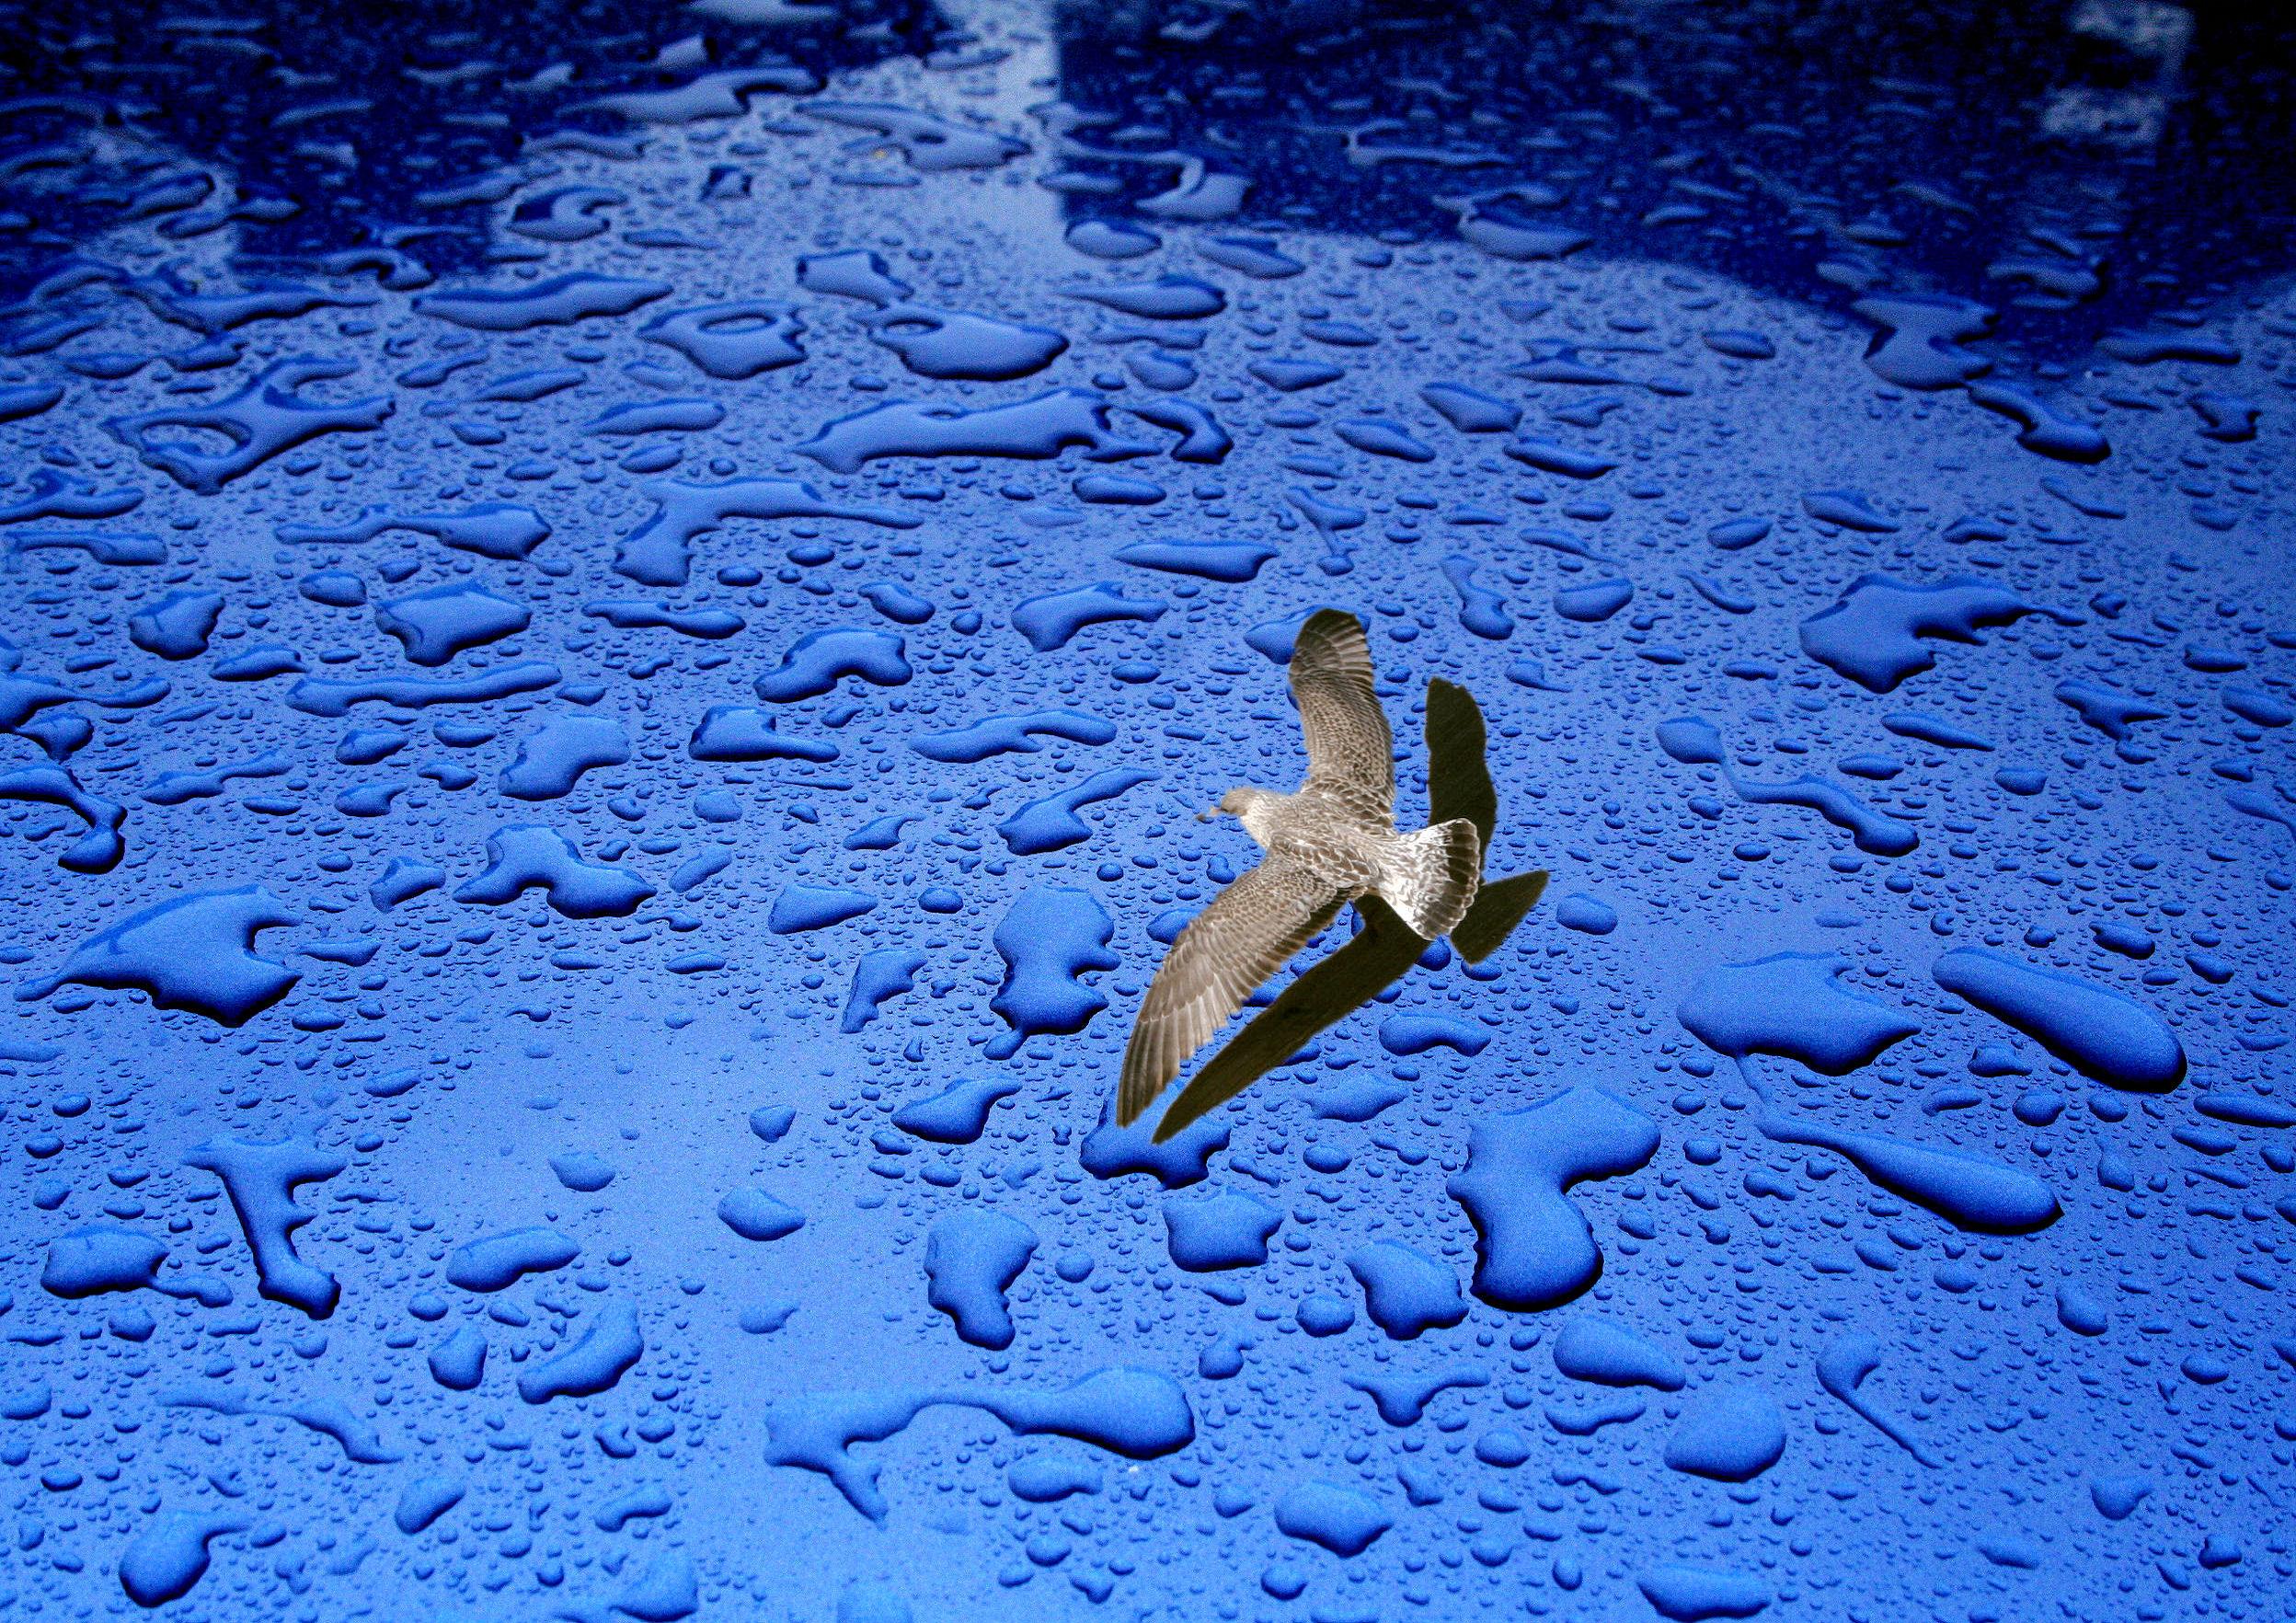 Blue seagull